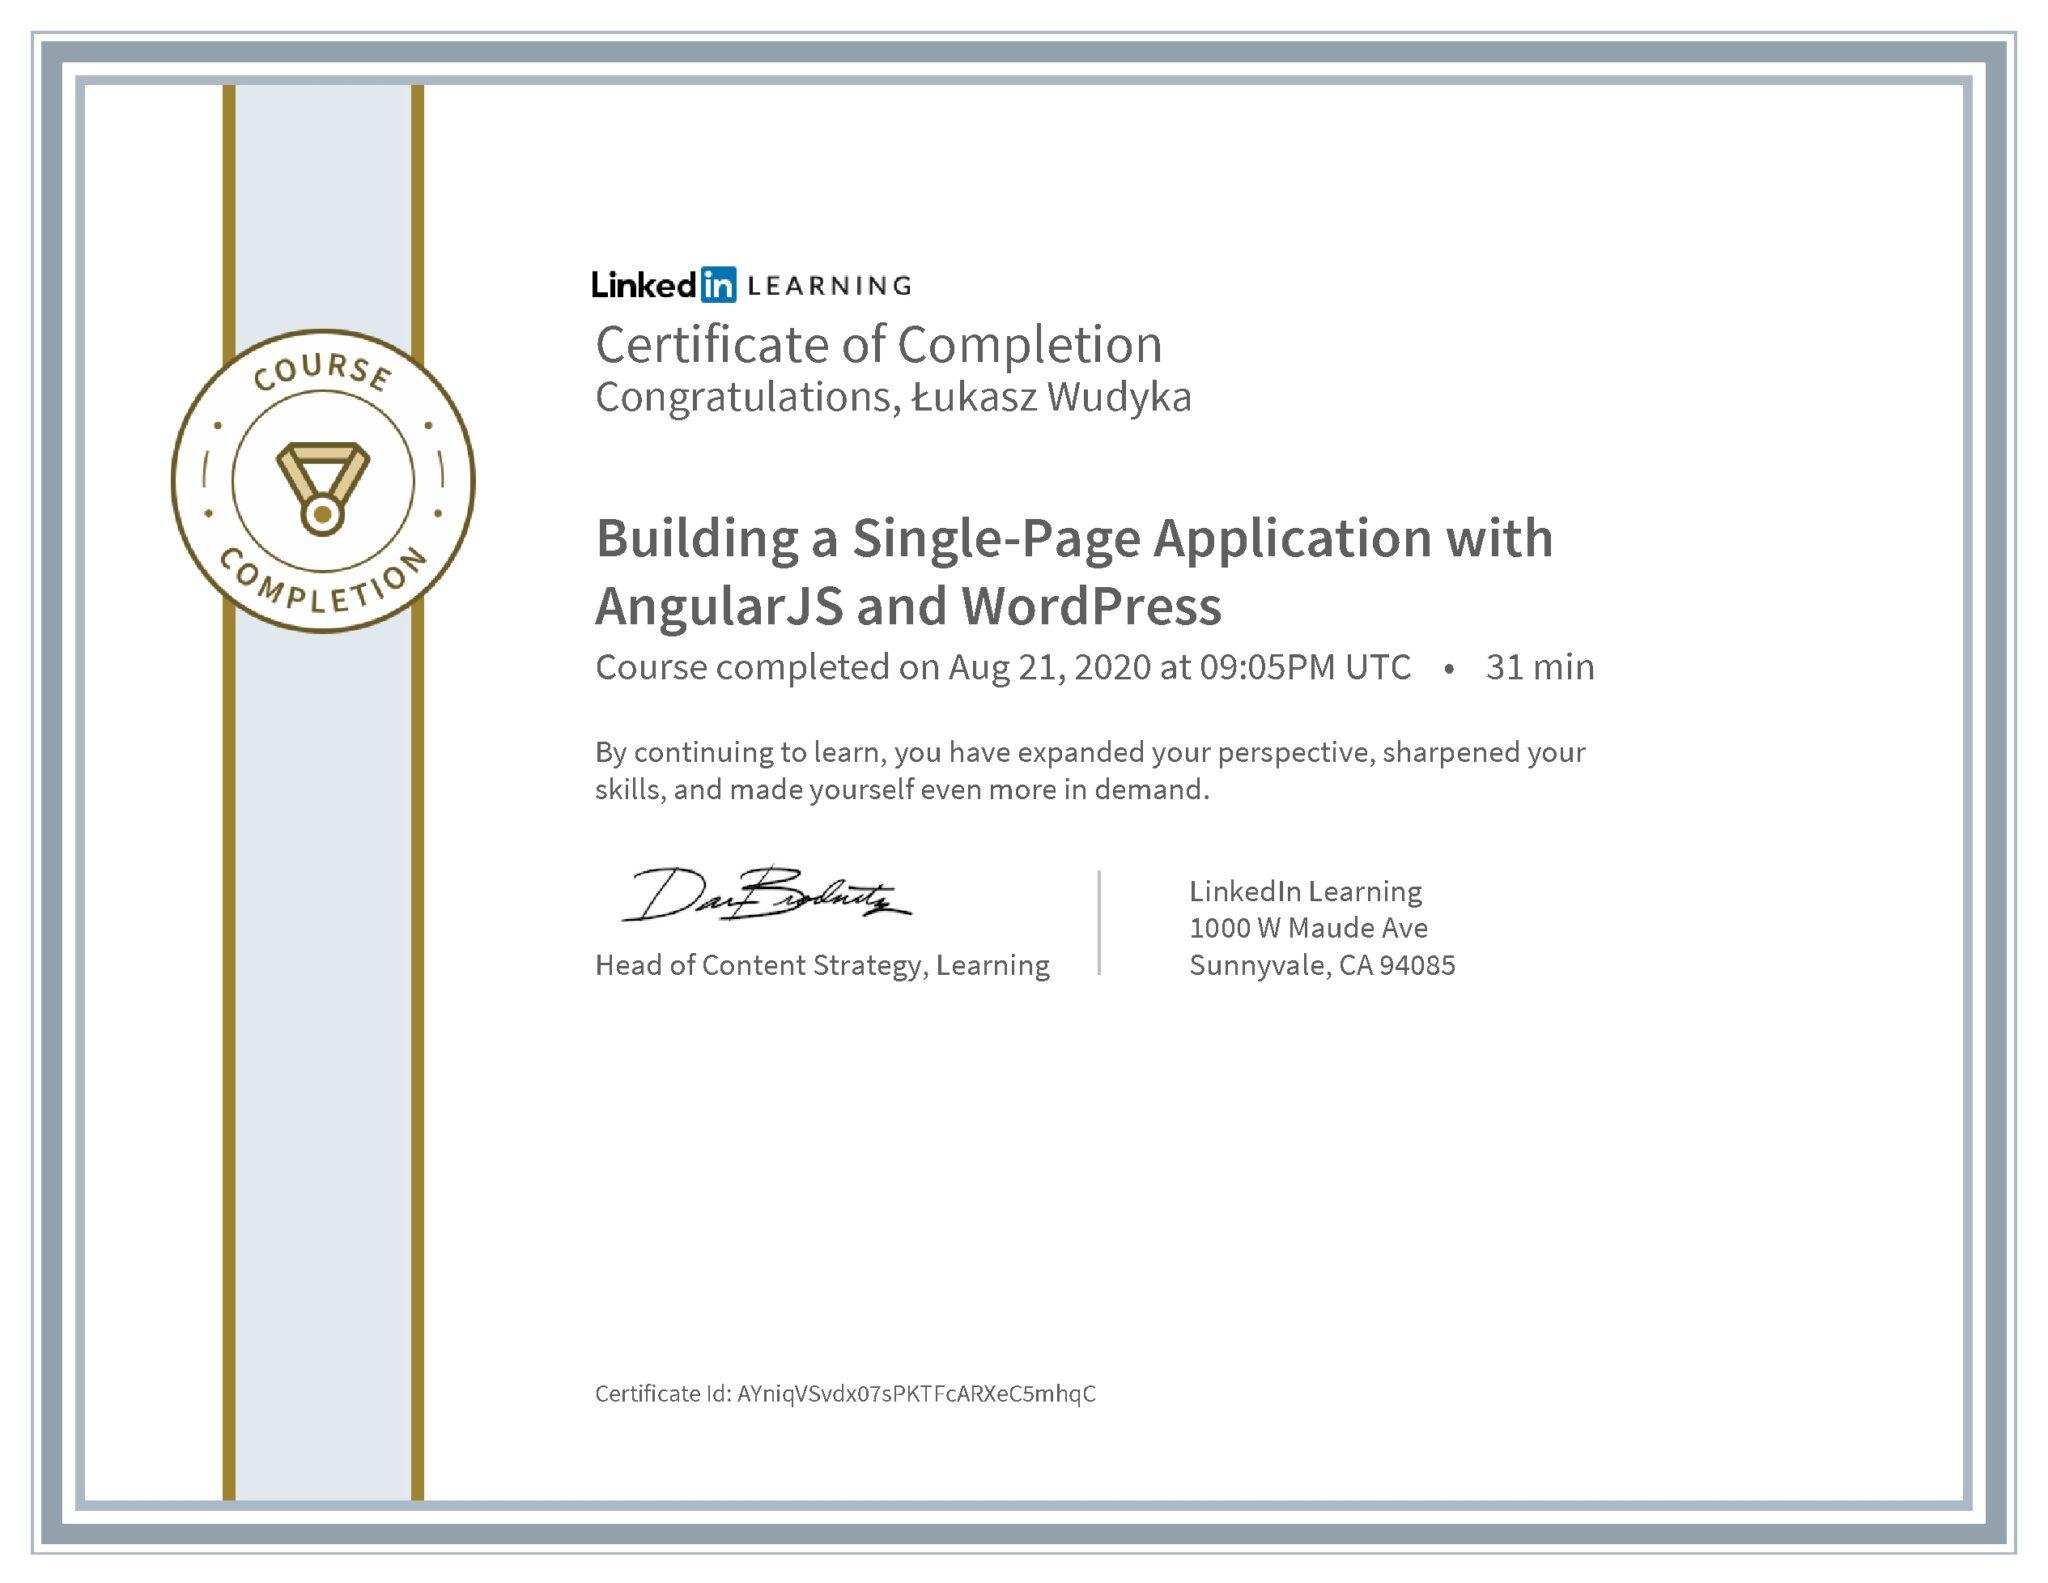 Łukasz Wudyka certyfikat LinkedIn Building a Single-Page Application with Angular JS and WordPress